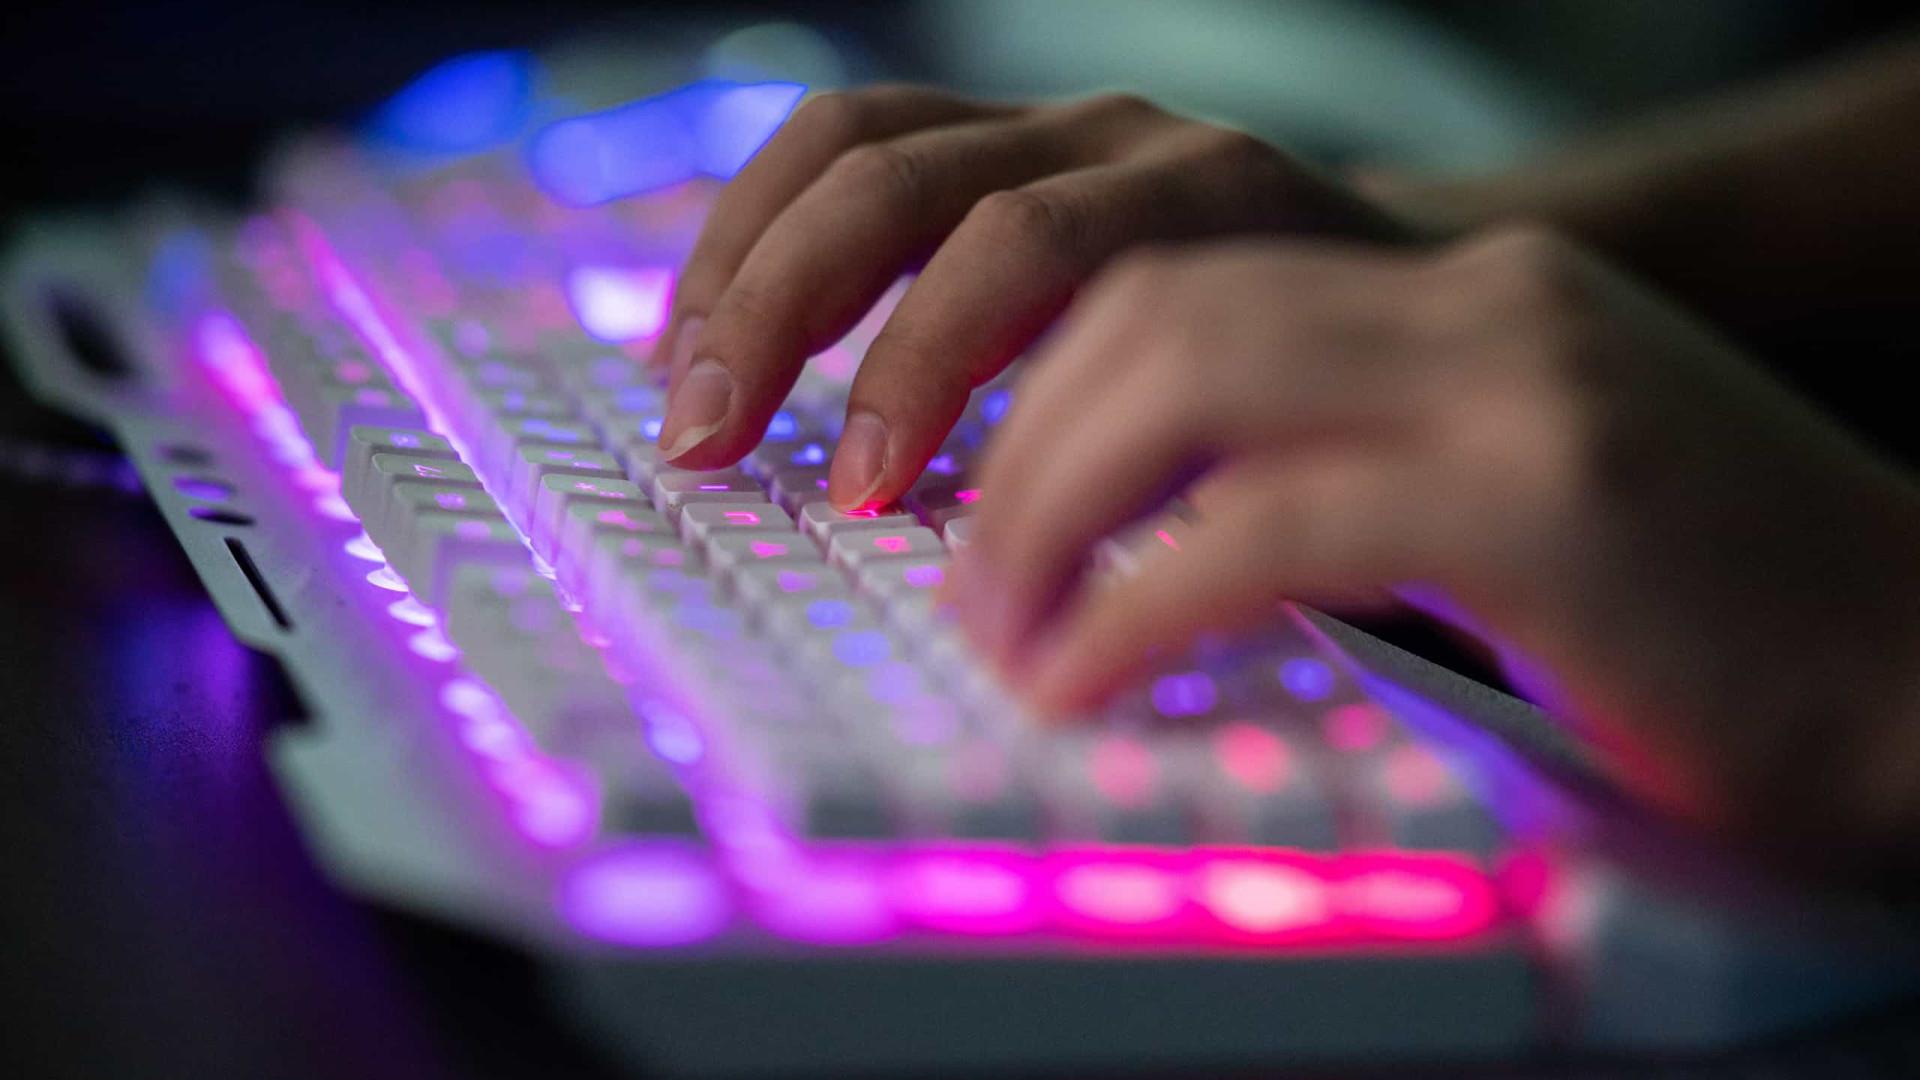 Grupo hacker reivindica ataque a 61 sites no País